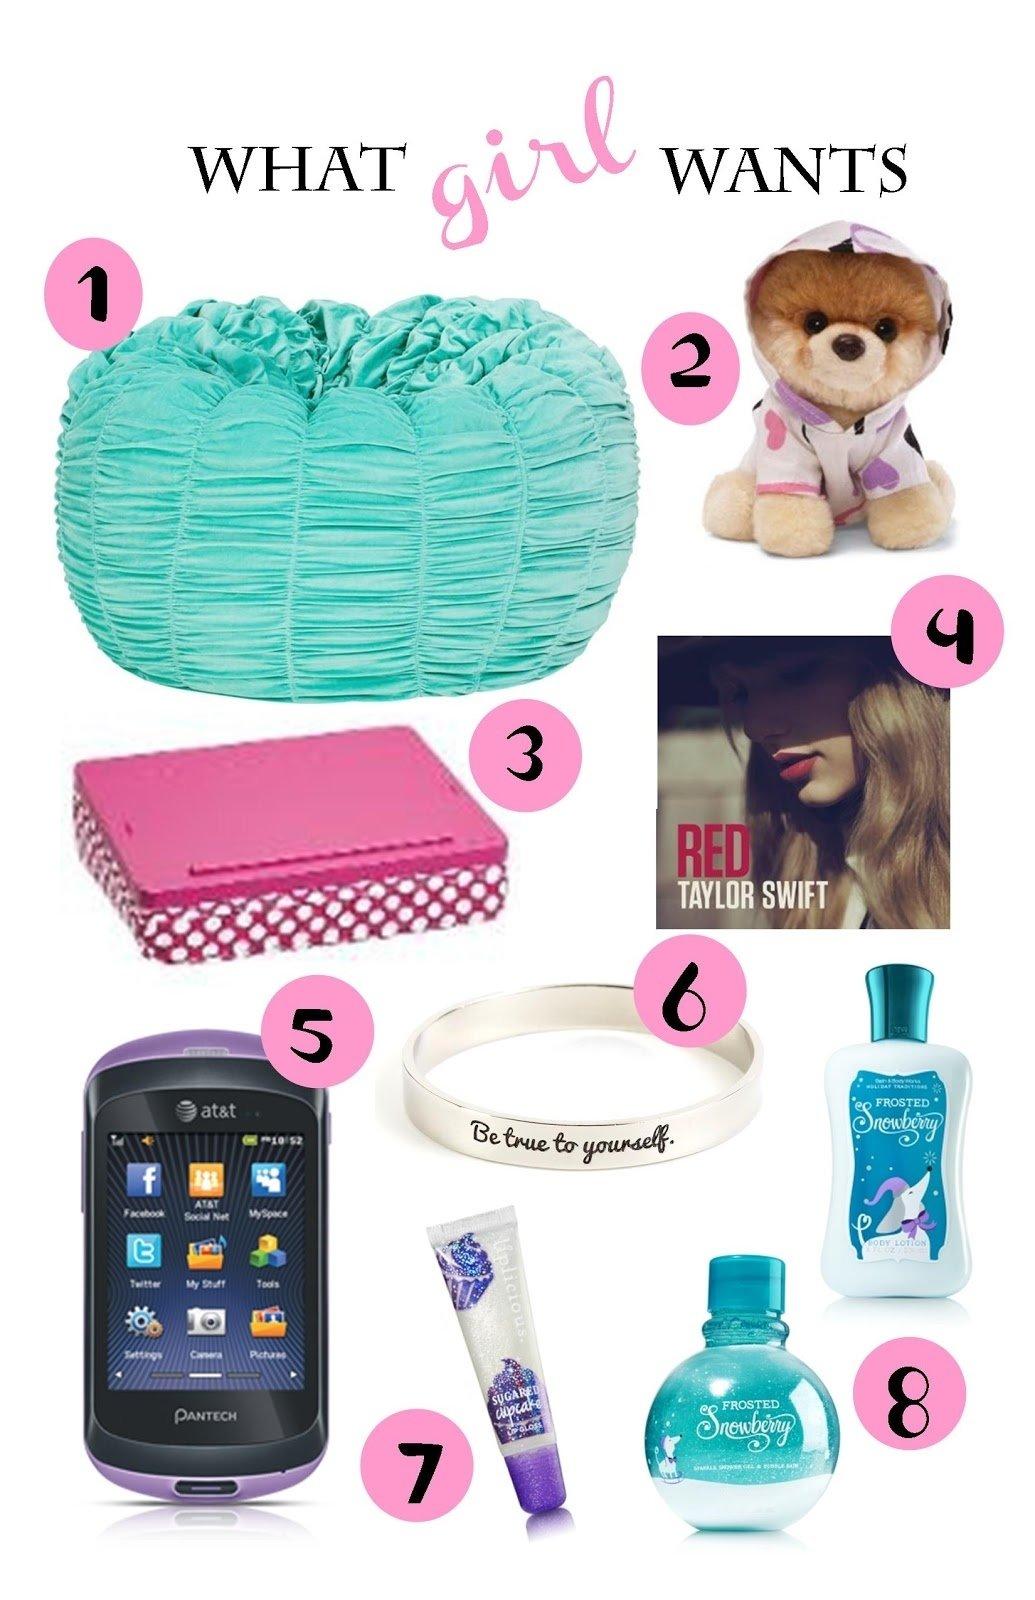 10 Attractive Tween Gift Ideas For Girls icing designs gift ideas for tween girls 17 2020